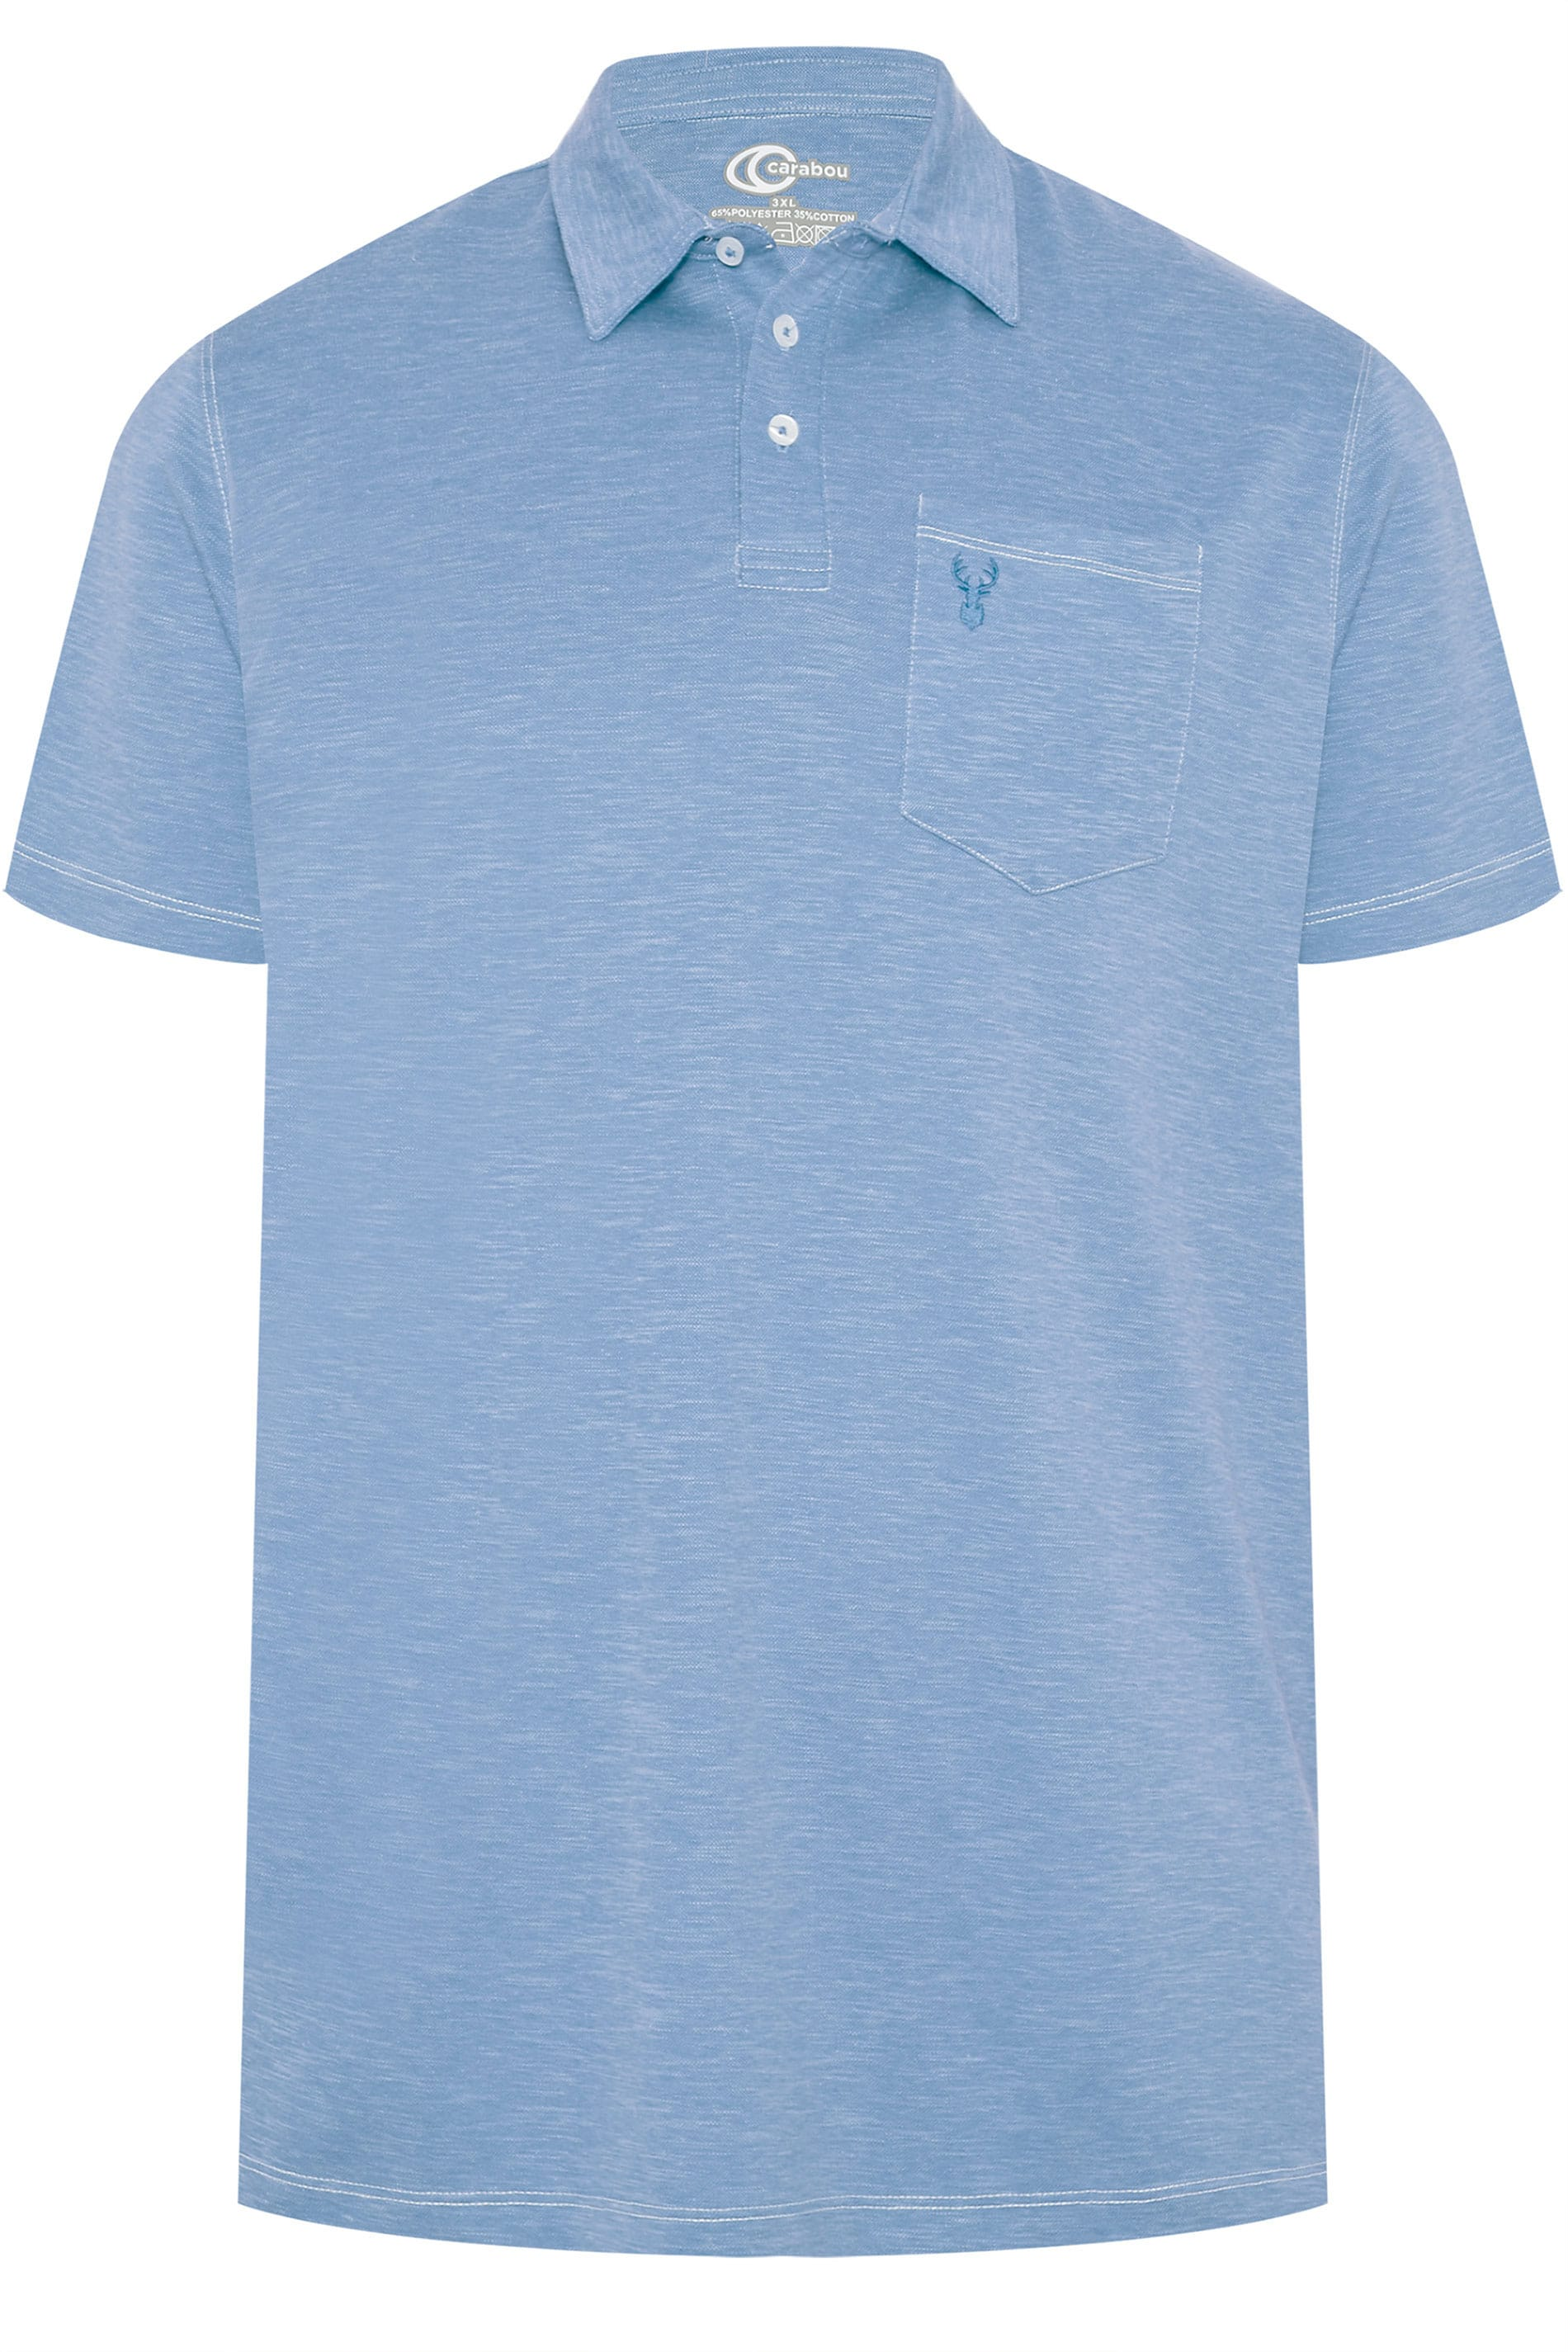 CARABOU Light Blue Marl Polo Shirt